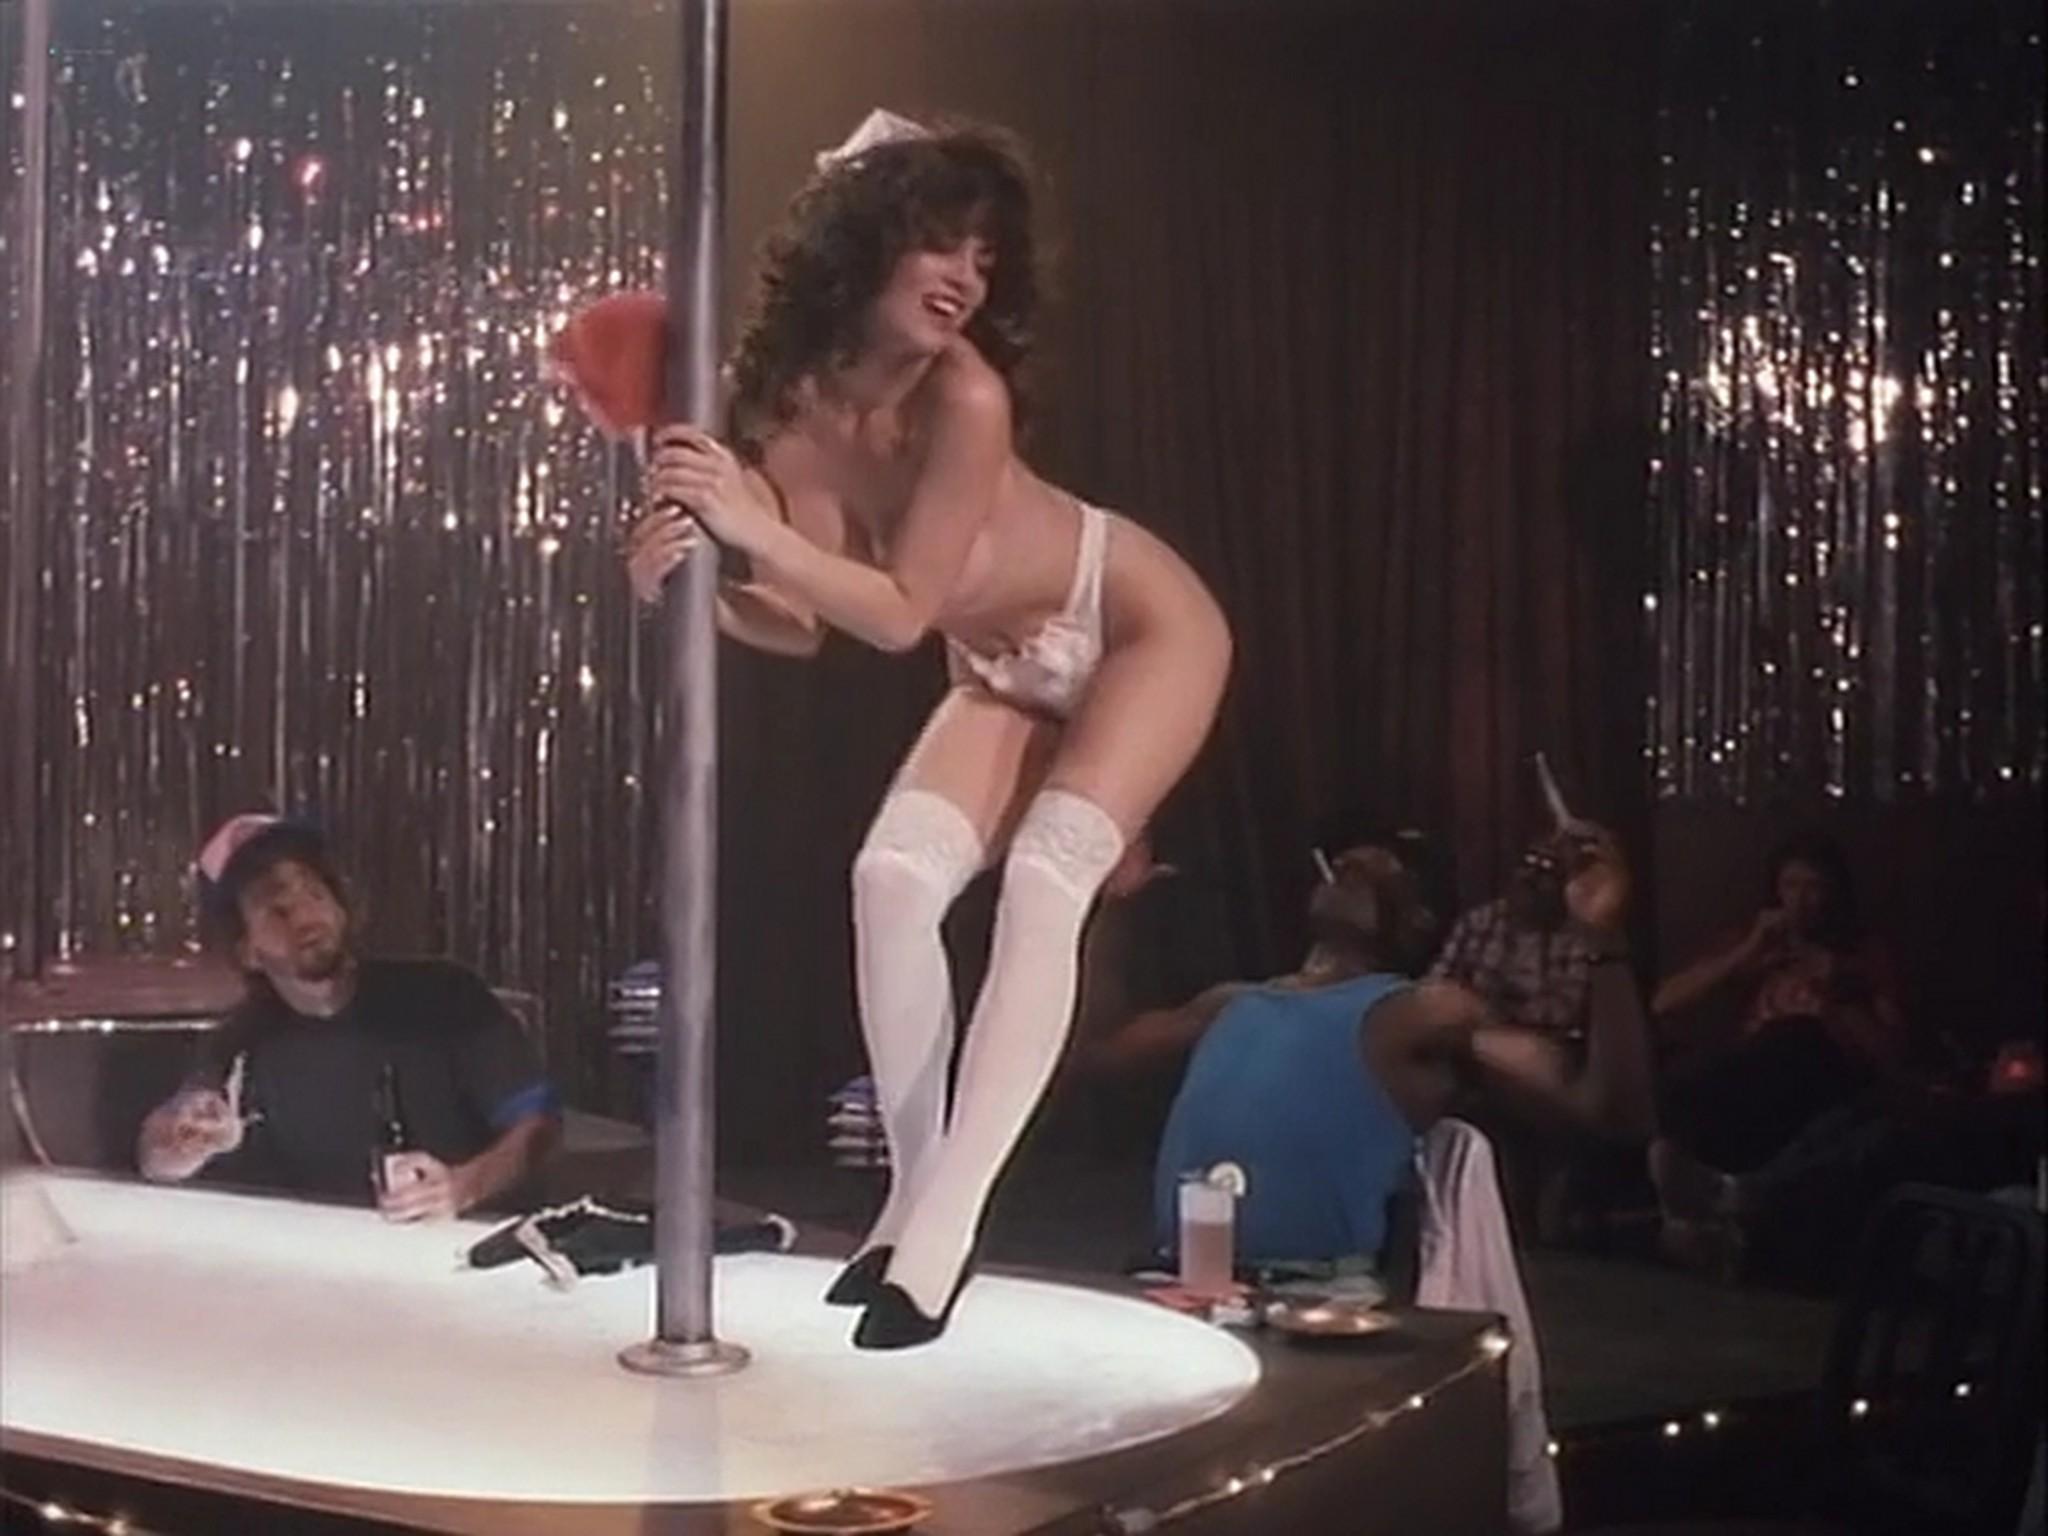 Barbara Alyn Woods nude Catya Sassoon Jill Pierce nude too as strippers Dance with Death 1991 15